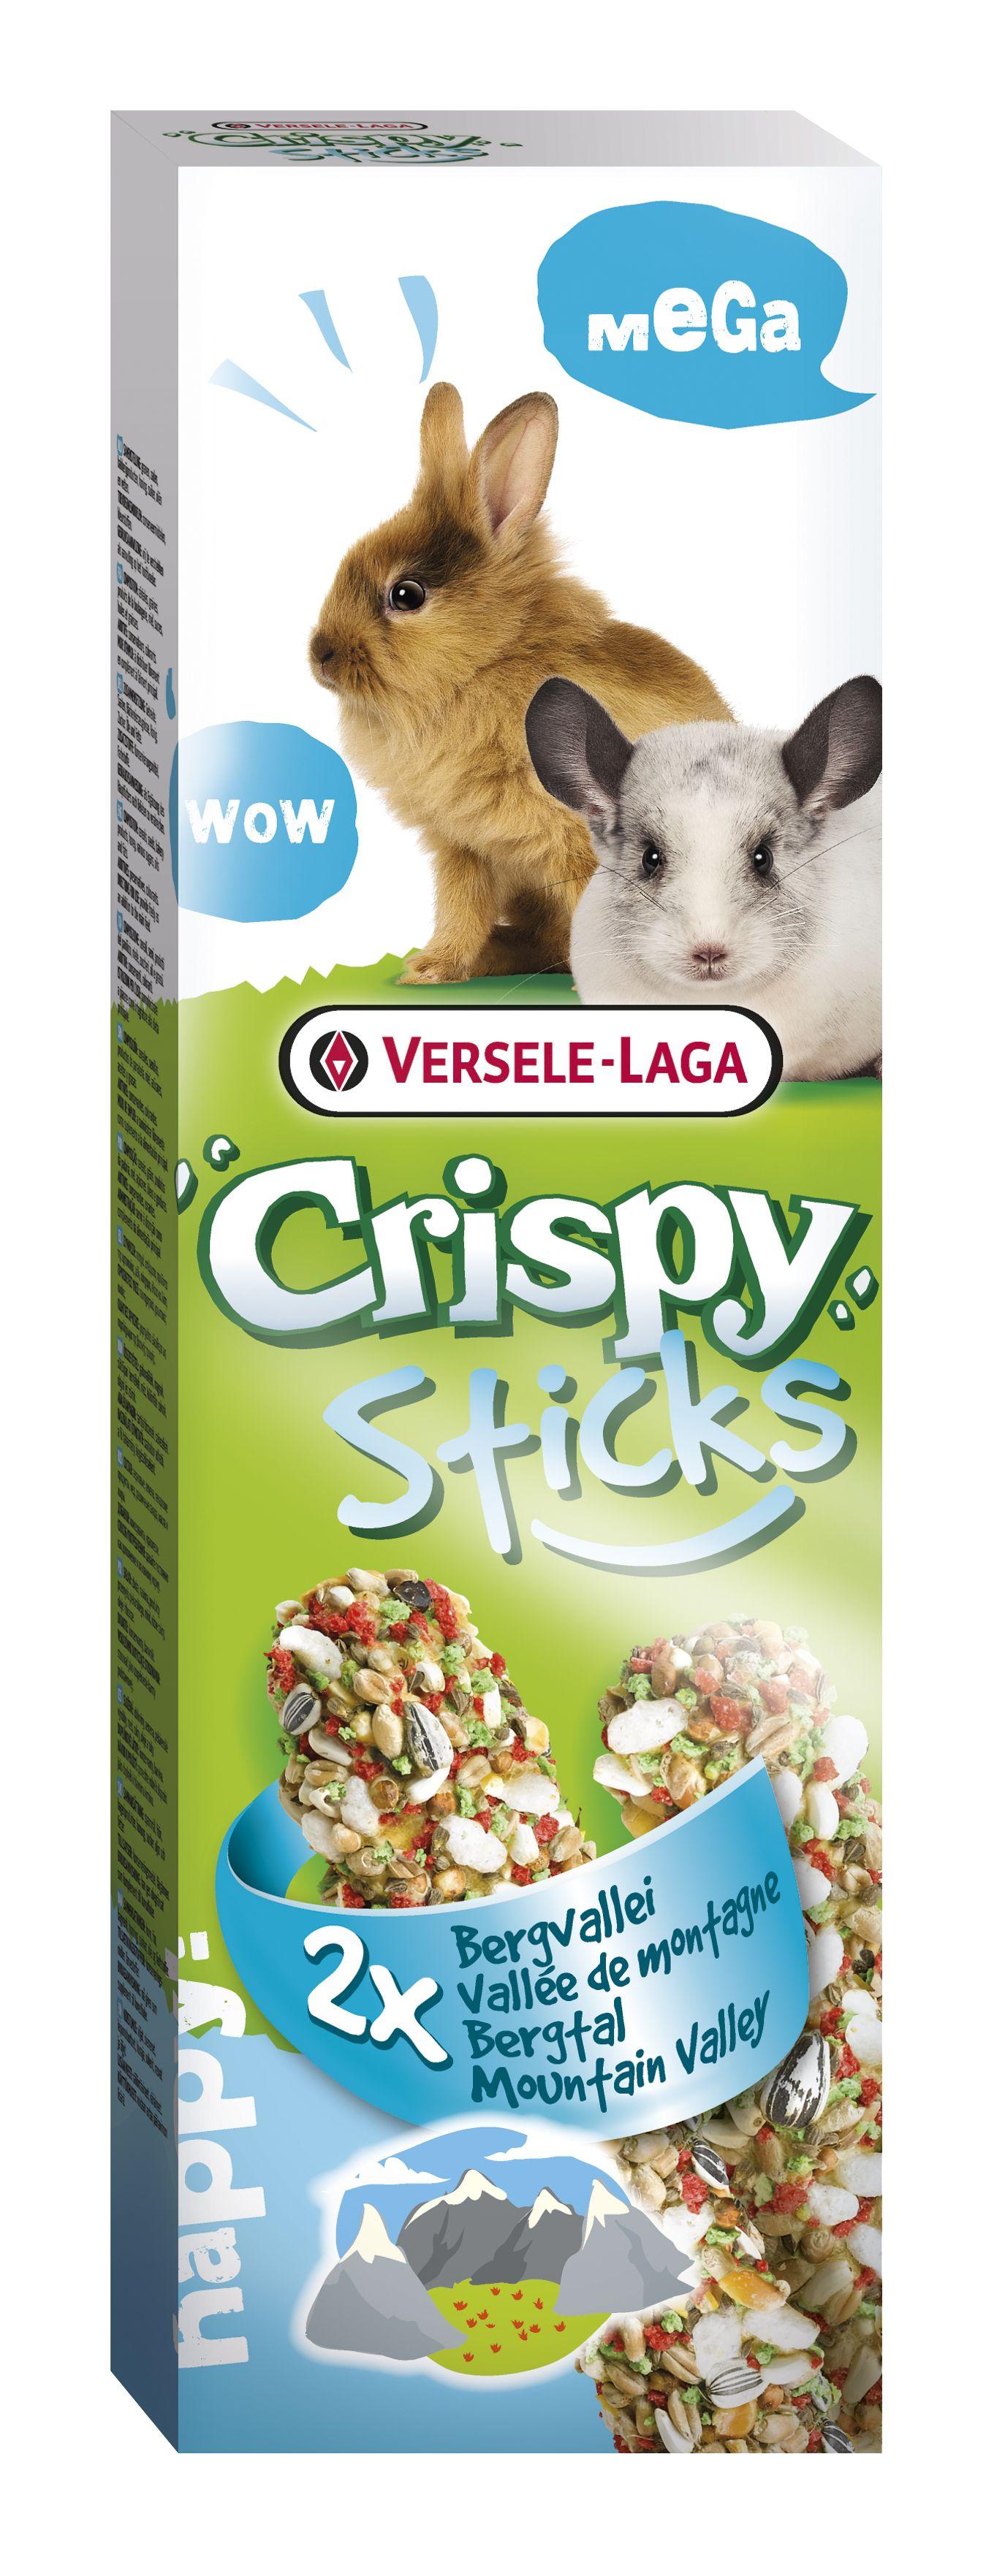 Stick Crispy Hierba de Montaña  (Conejo/Chinchilla